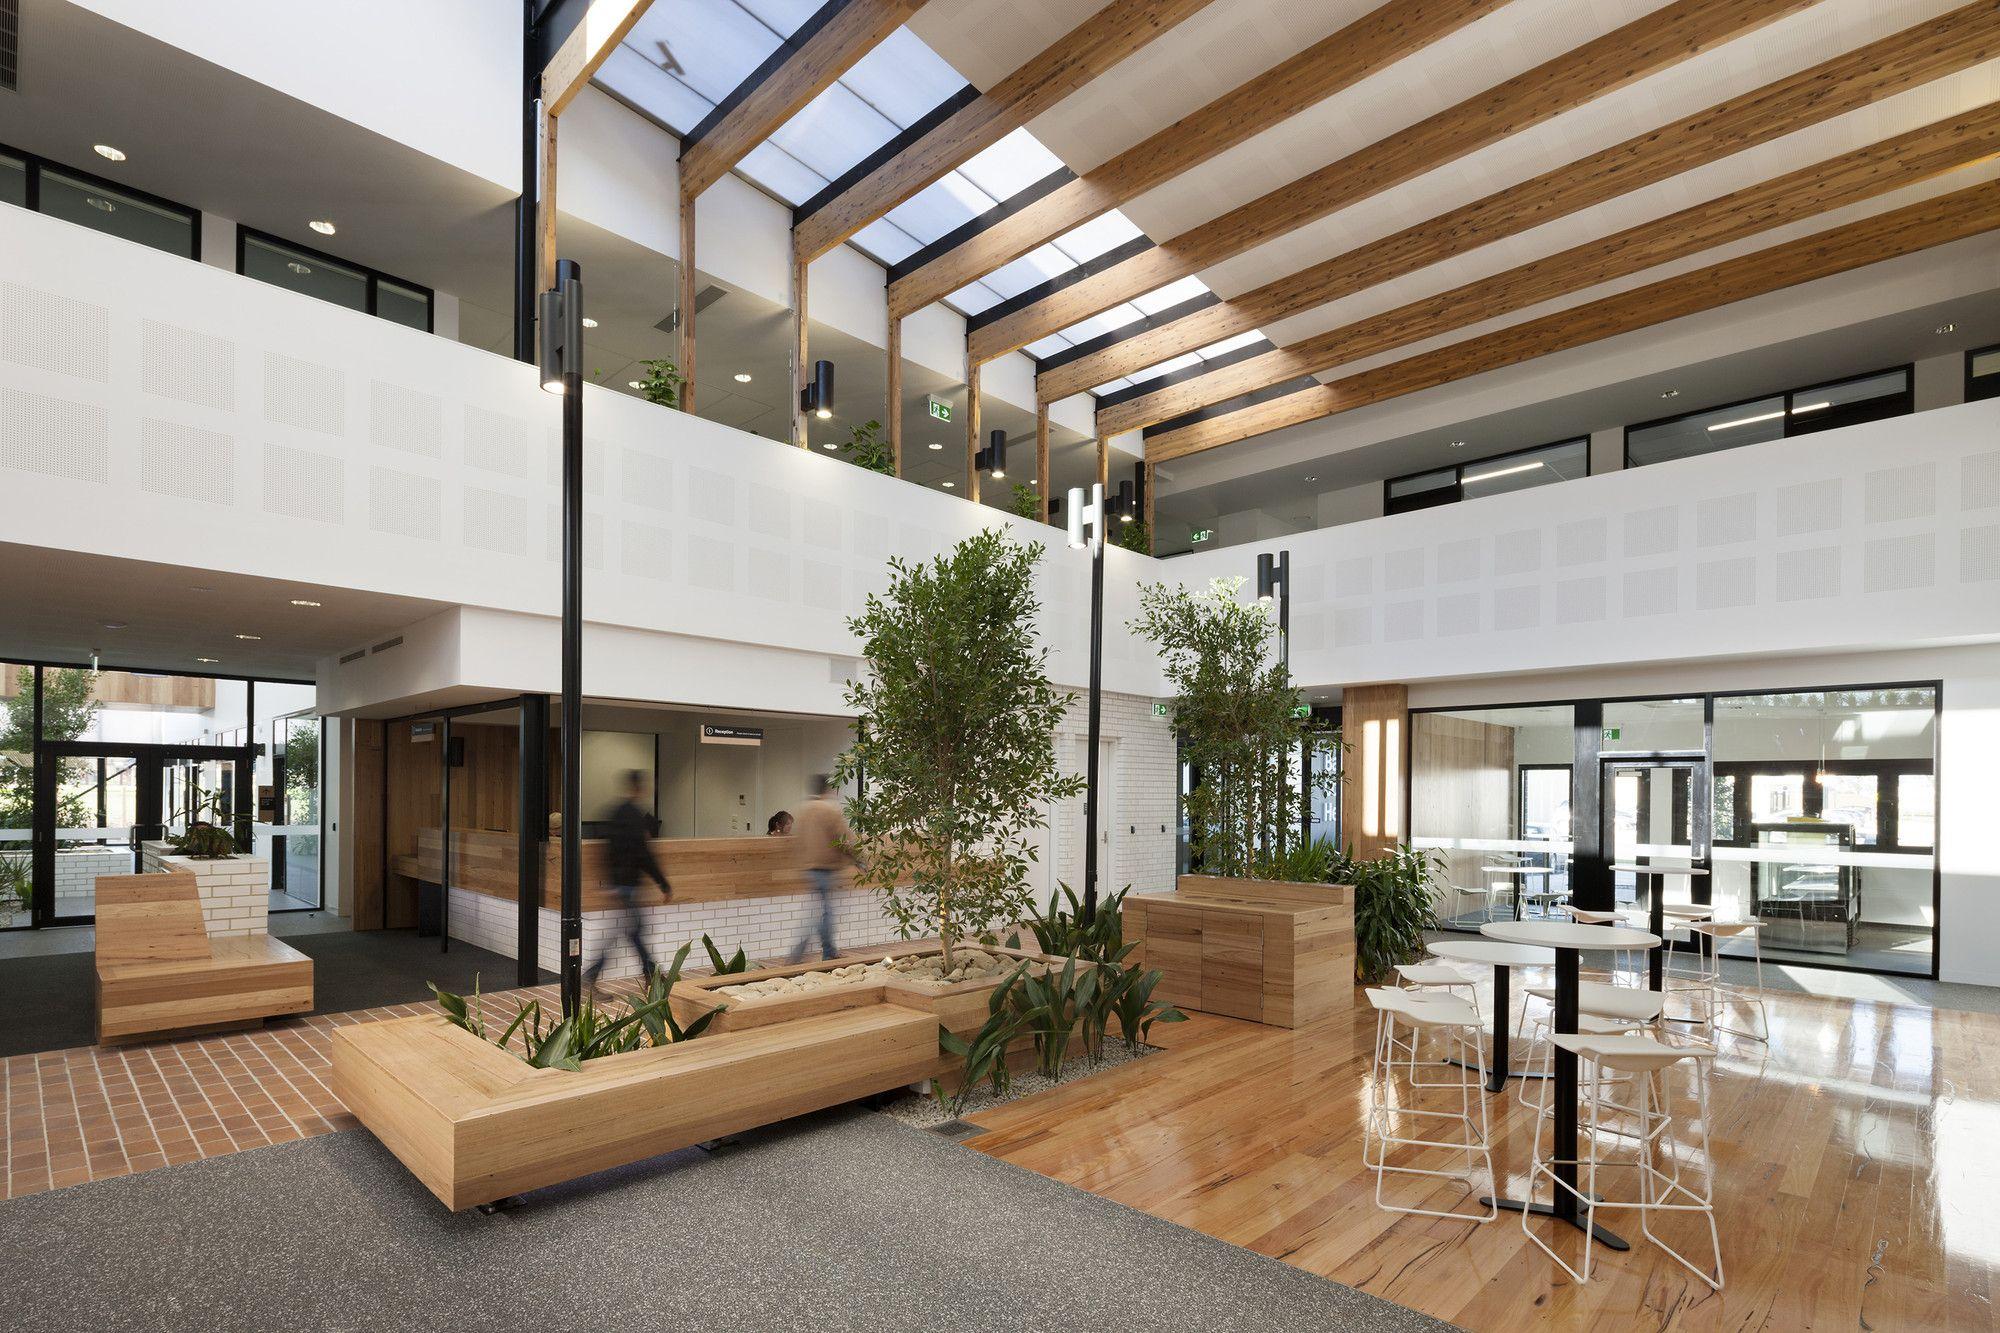 Health care center design concept